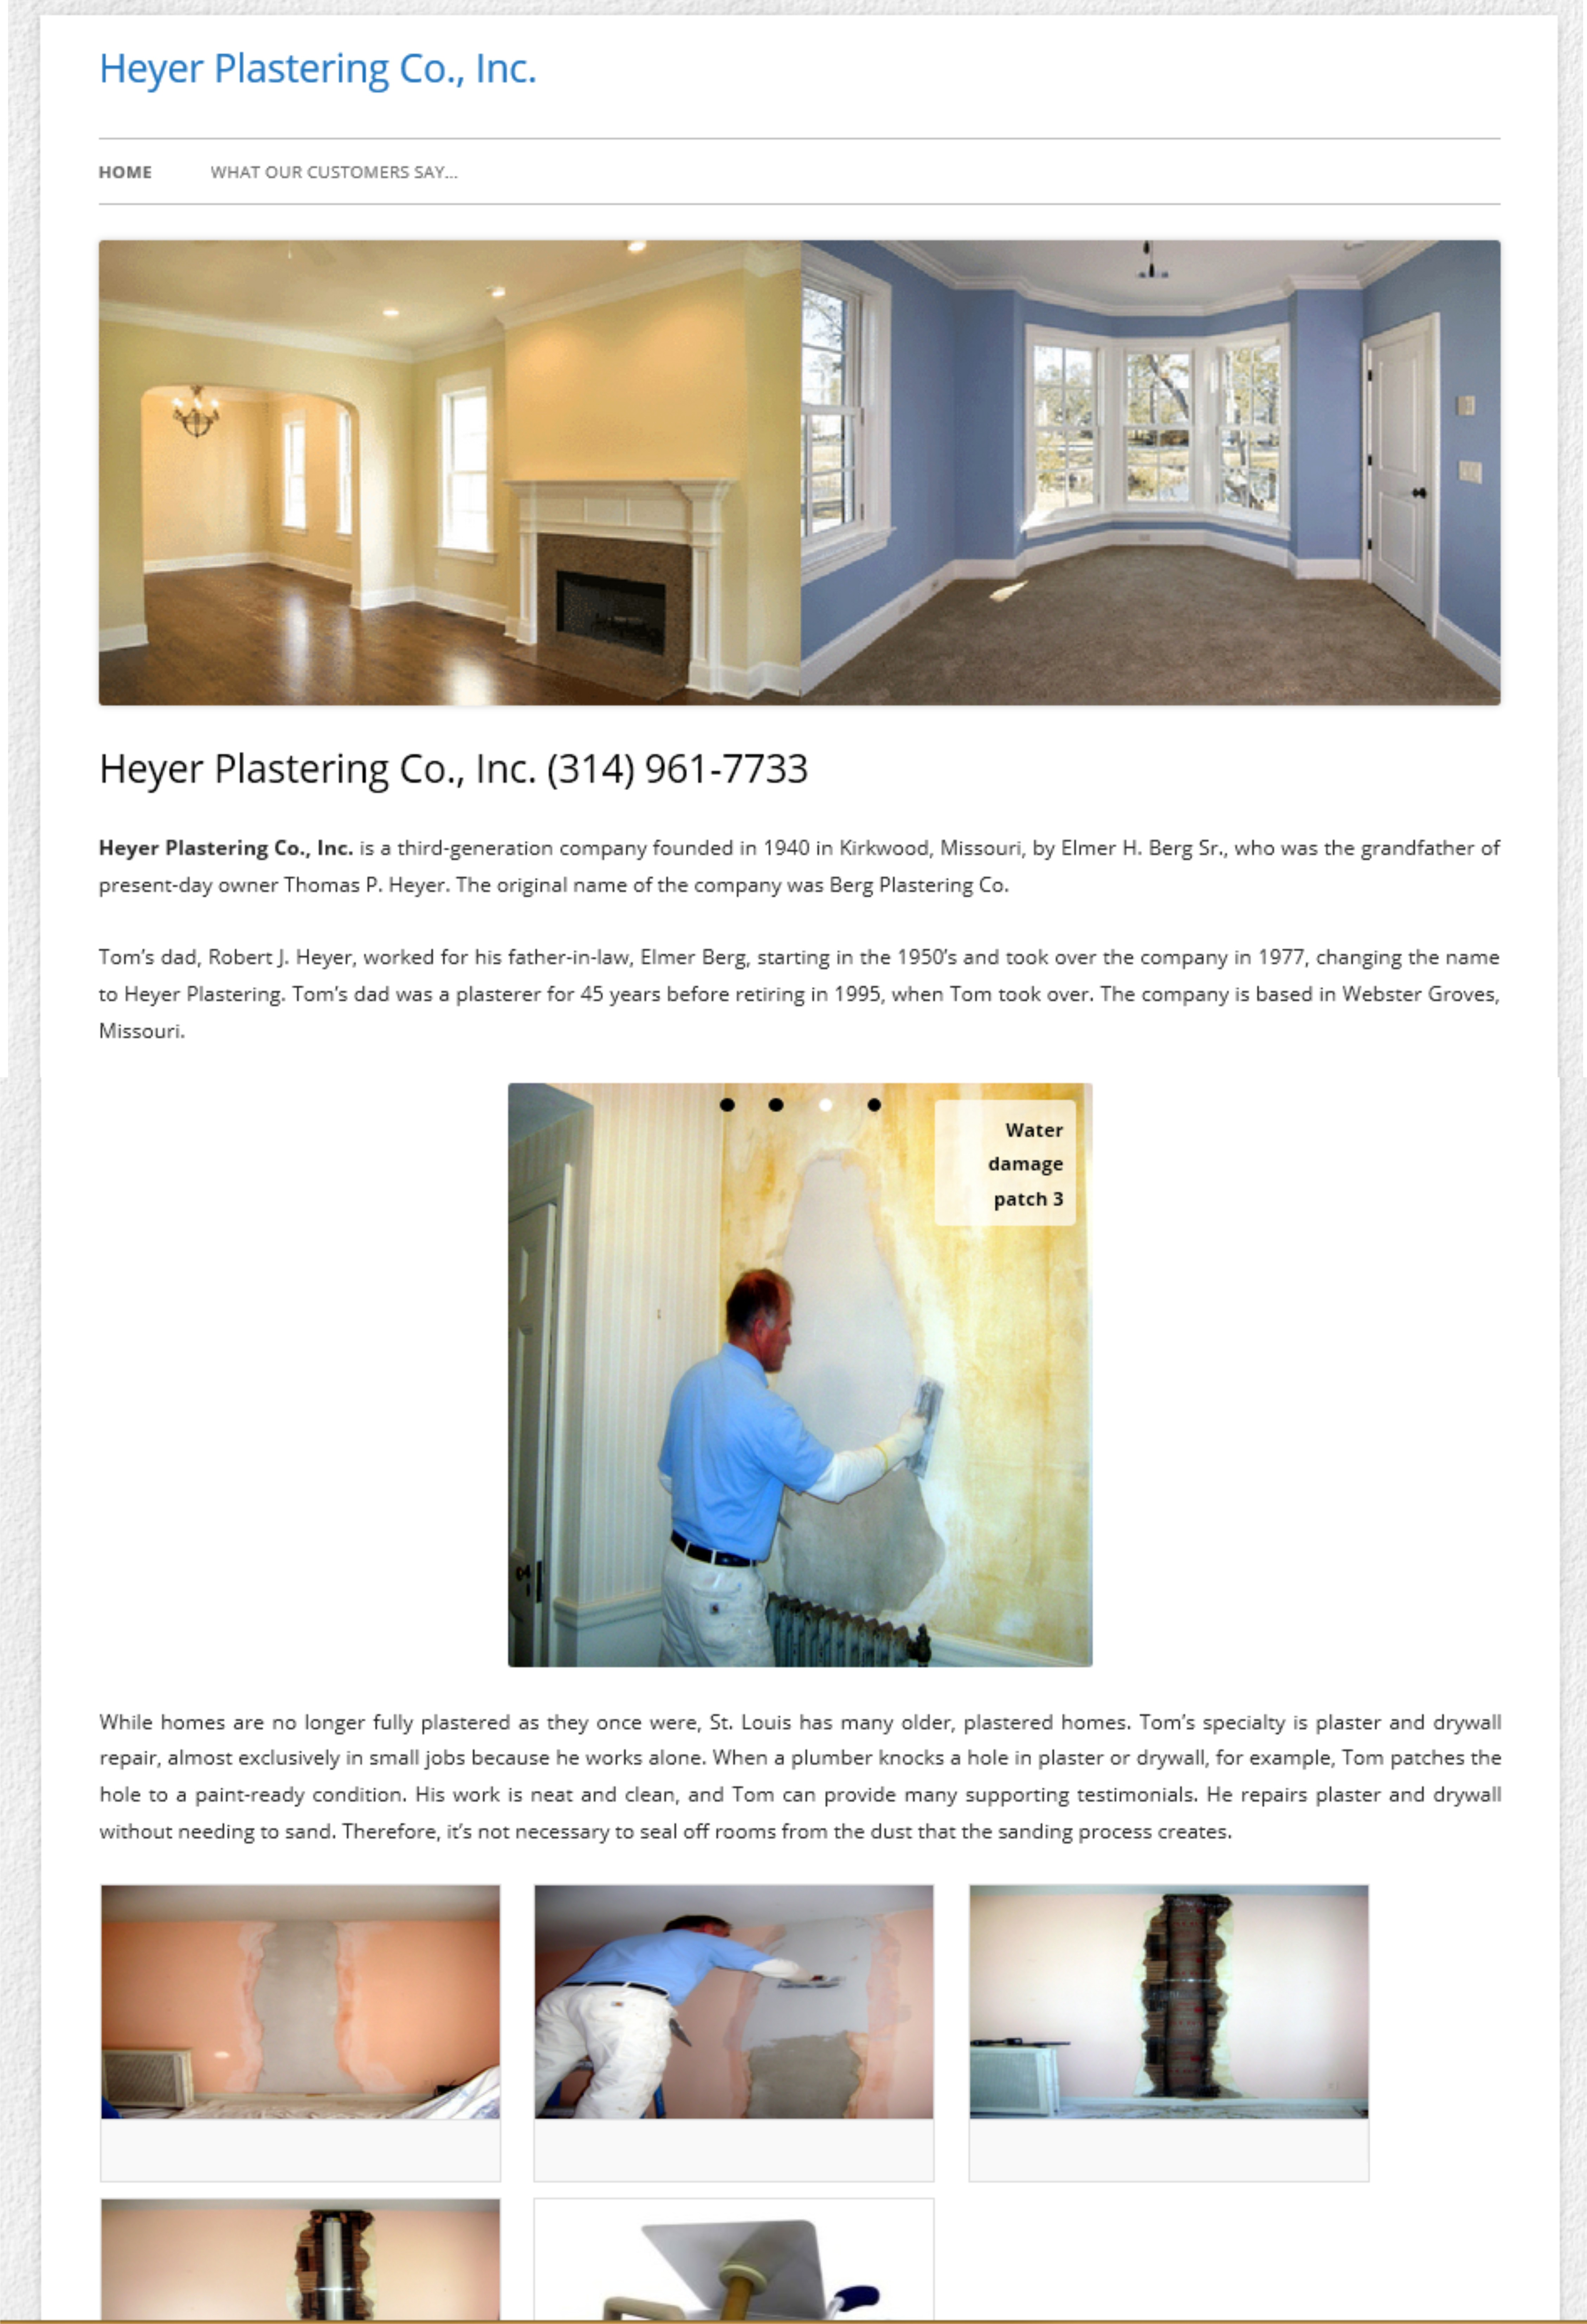 Web Design St Louis - Heyer plastering Co.